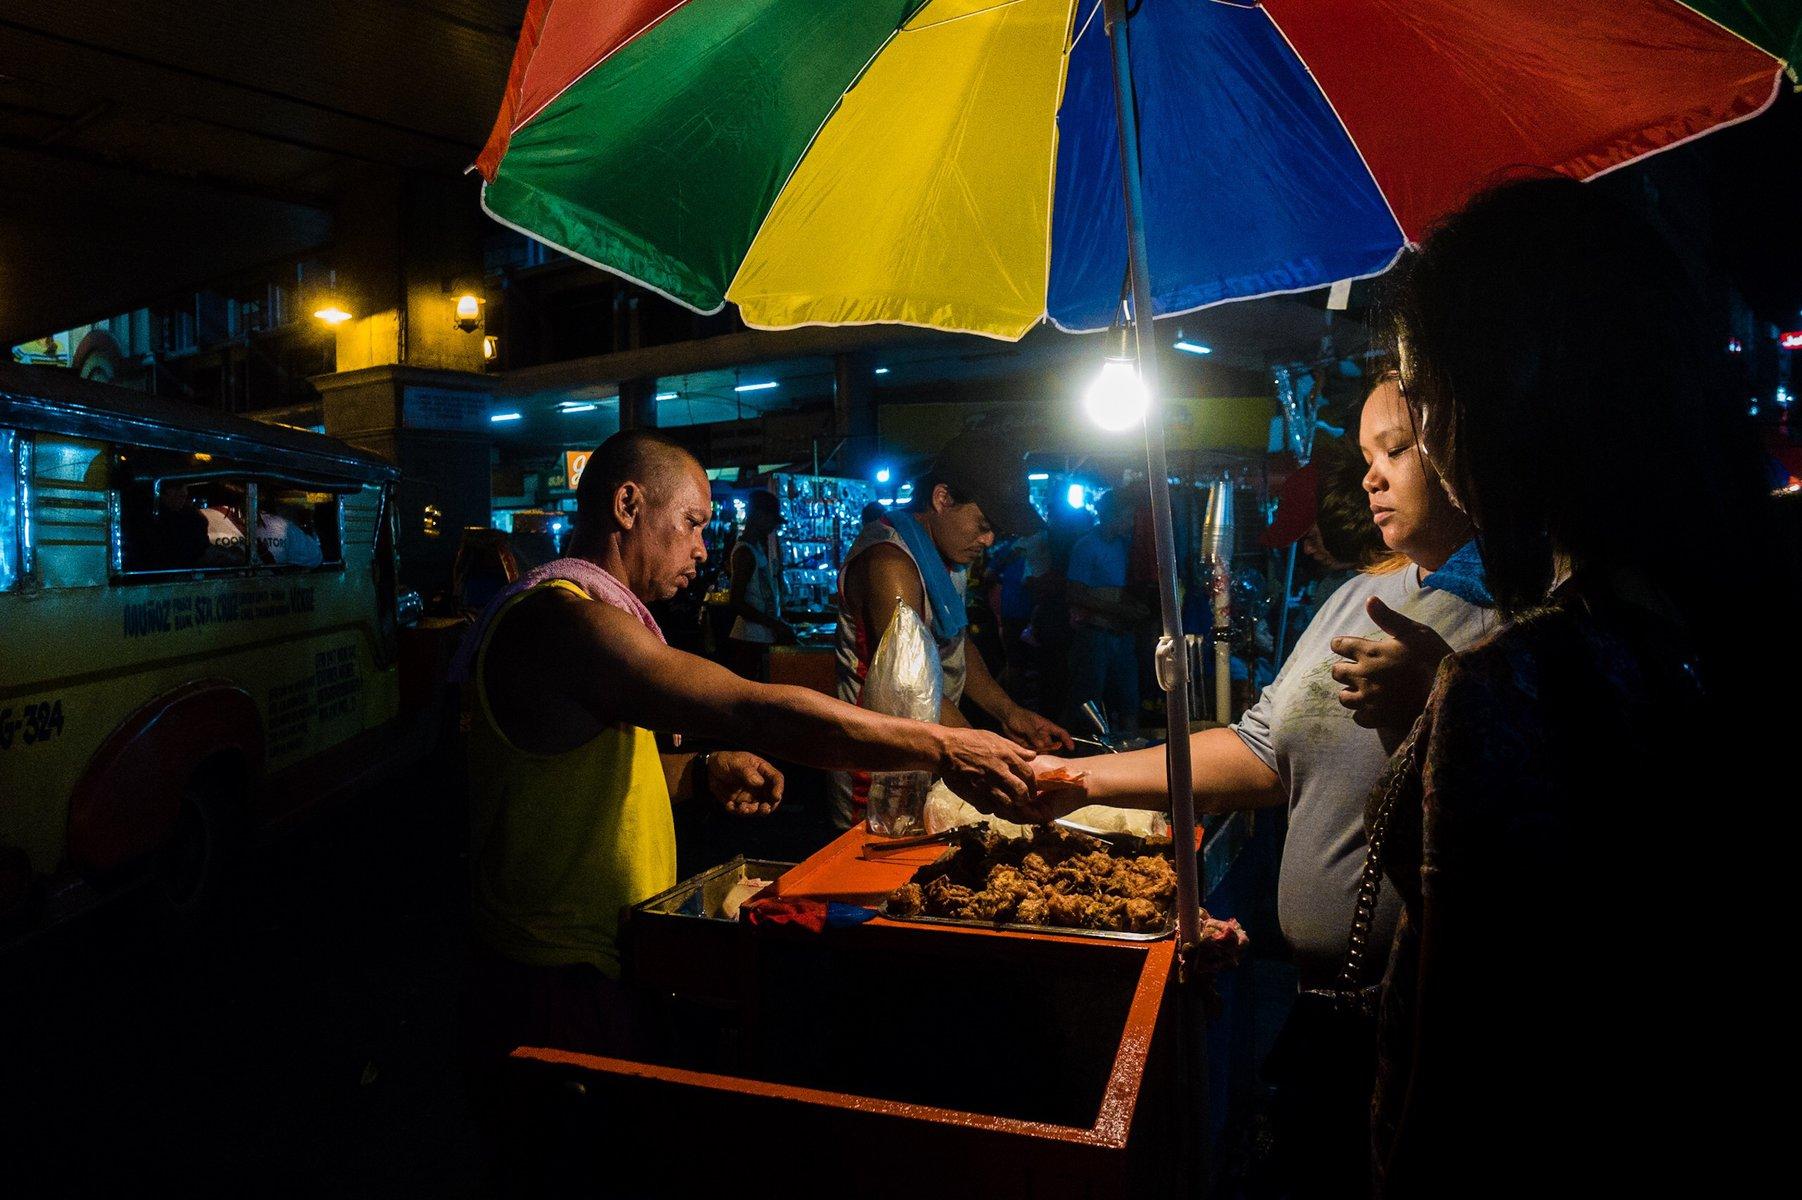 Sale! Carriedo, Sta. Cruz, Manila at night.